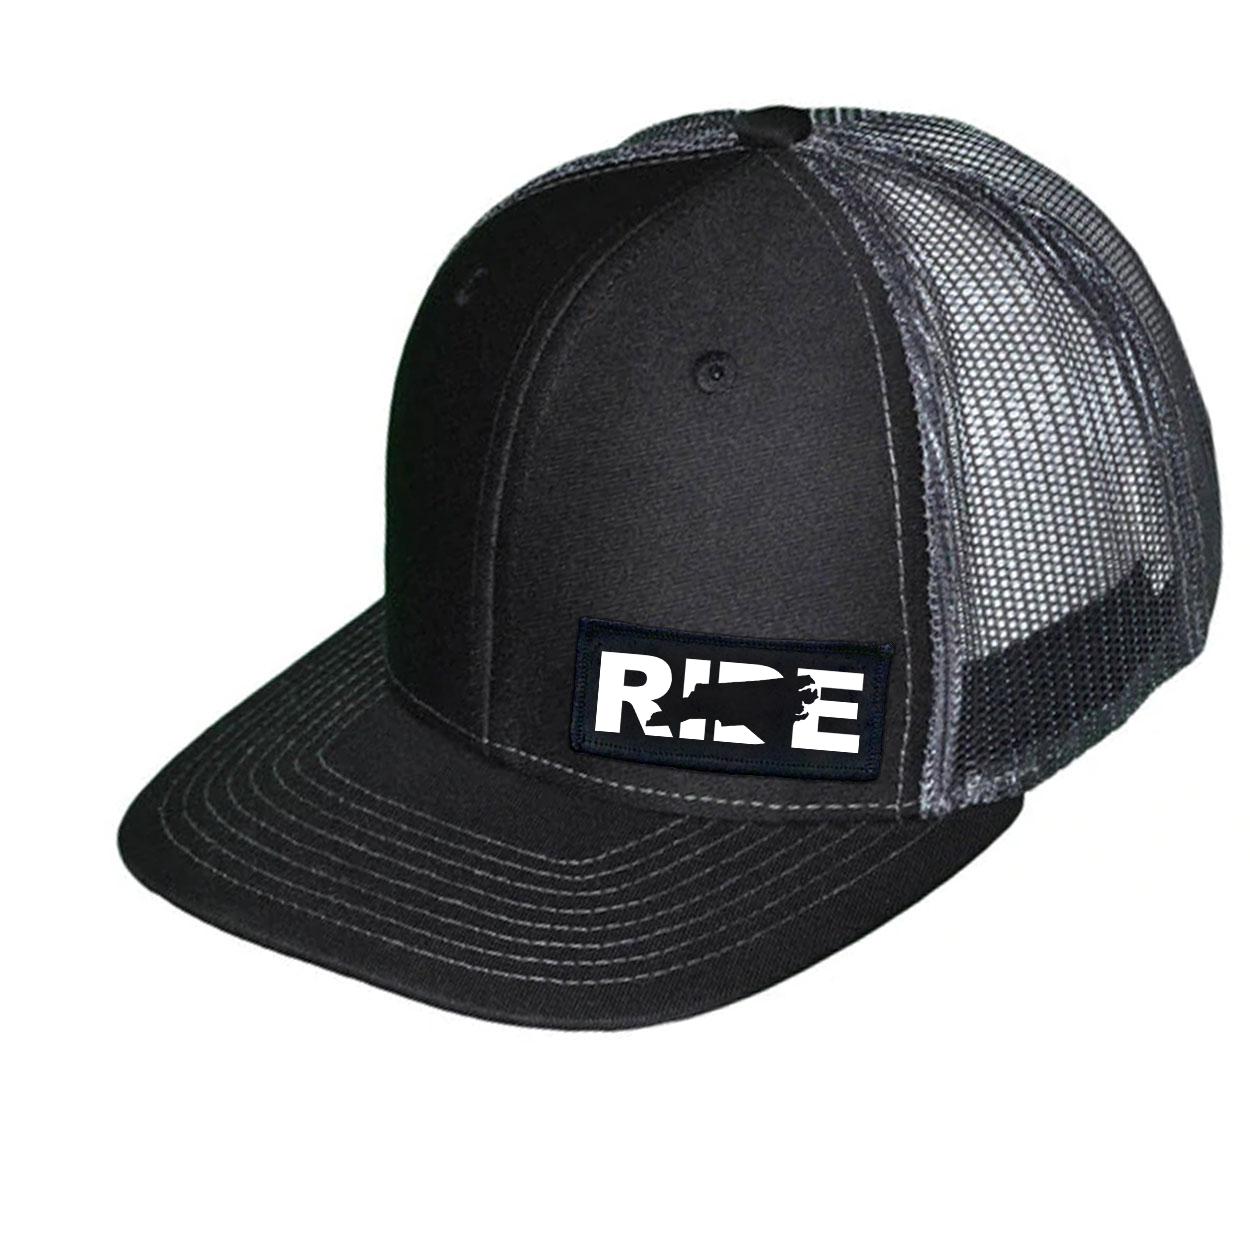 Ride North Carolina Night Out Woven Patch Snapback Trucker Hat Black/Dark Gray (White Logo)